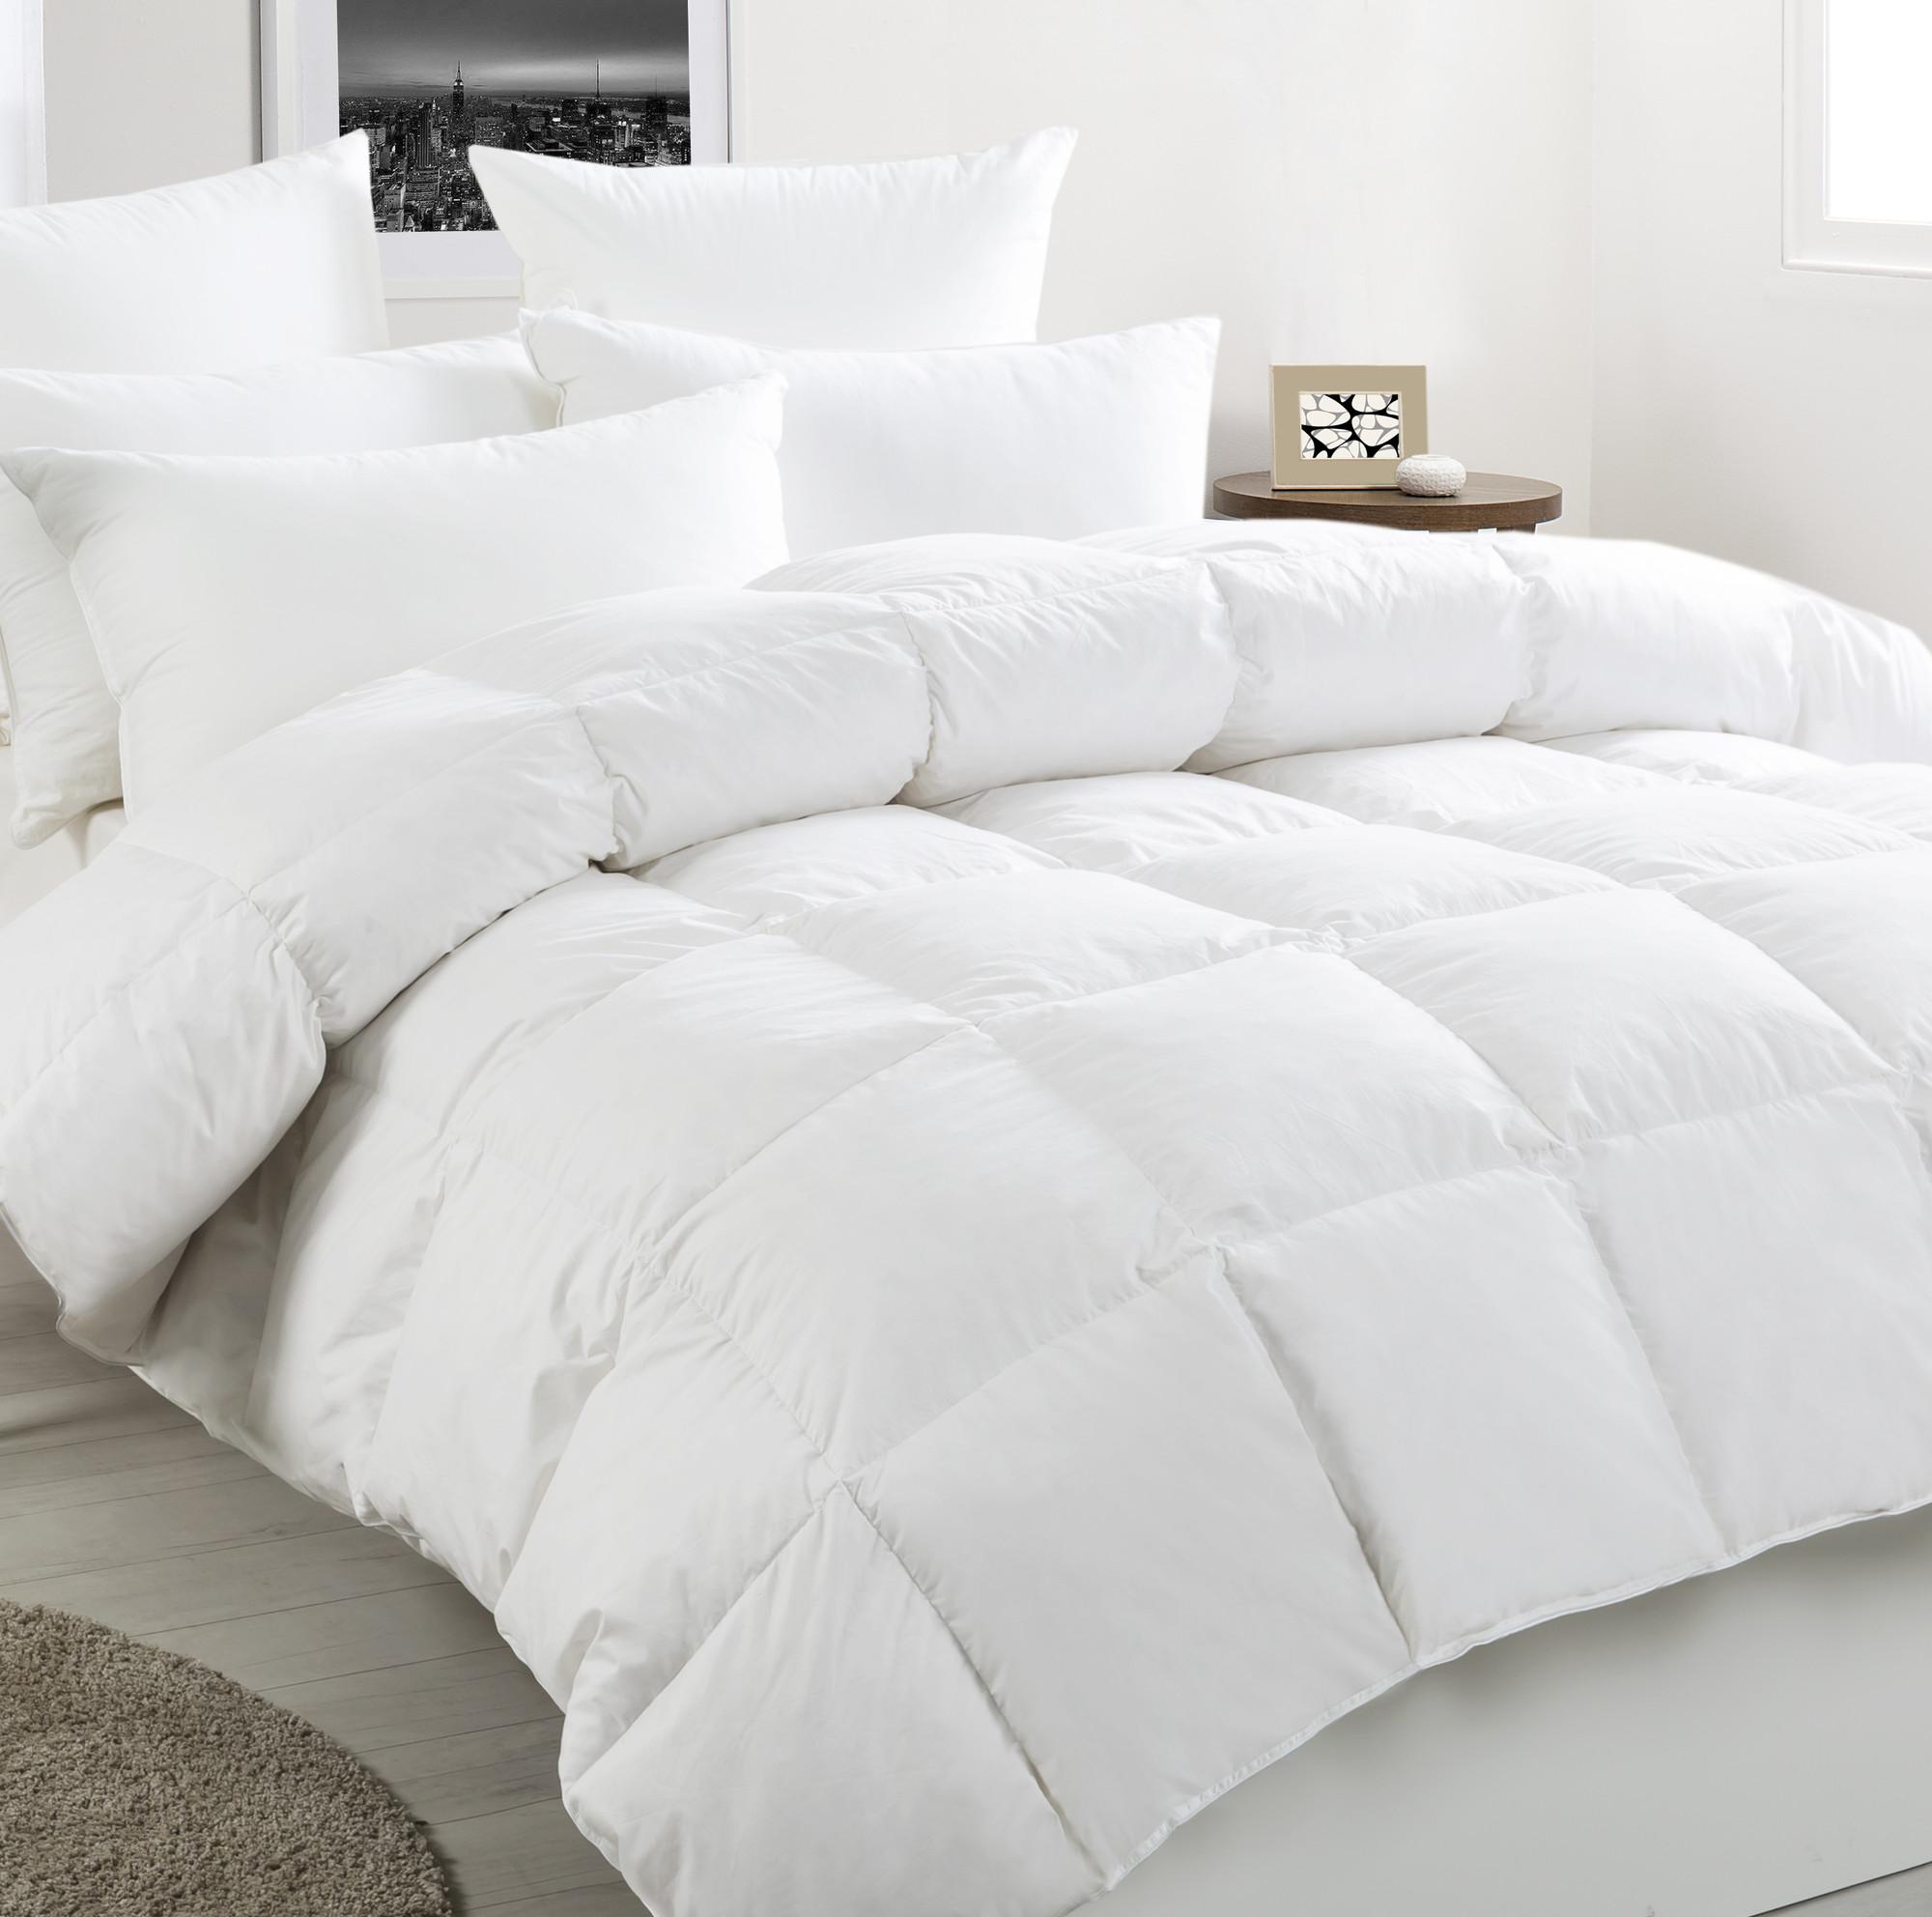 soft white feather com walmart somerset comforter duvet blend duck bedding quilt ip cotton home down